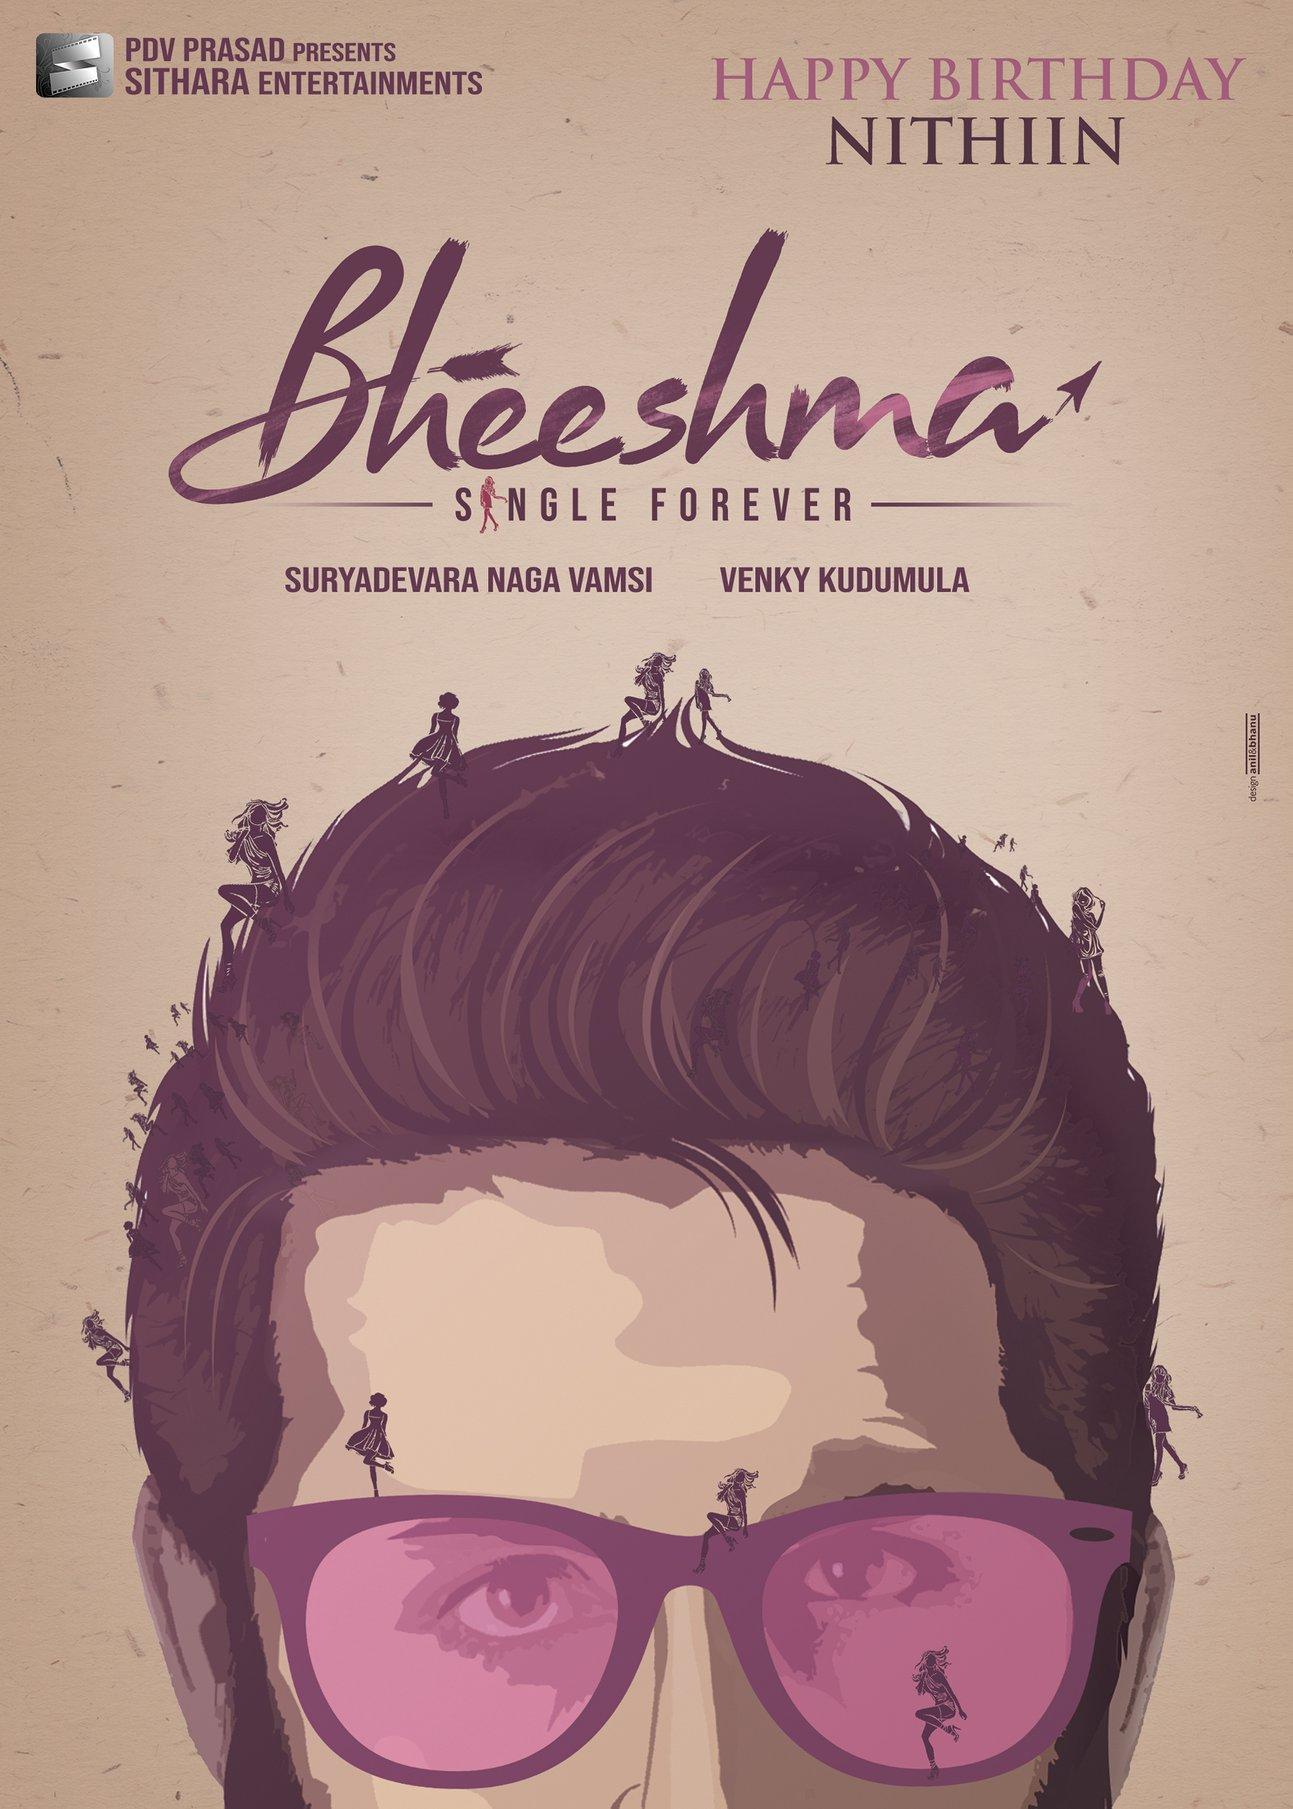 Bheeshma Single Forever Nithin Birthday Wishes Poster HD